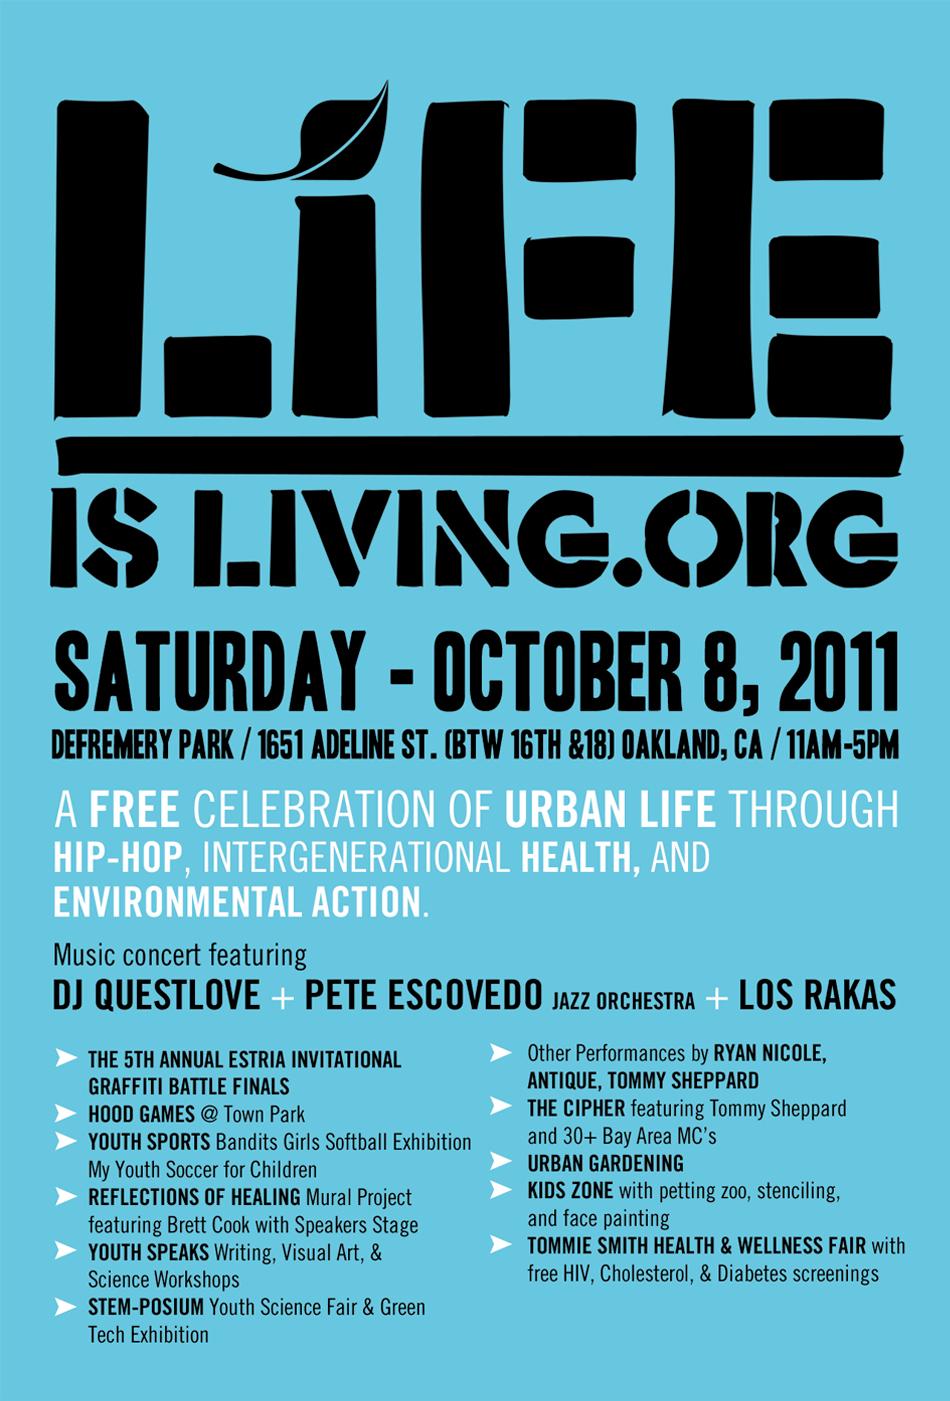 https://i0.wp.com/www.lifeisliving.org/ecoequity/wp-content/uploads/2011/09/LIL_Poster_2011.jpg